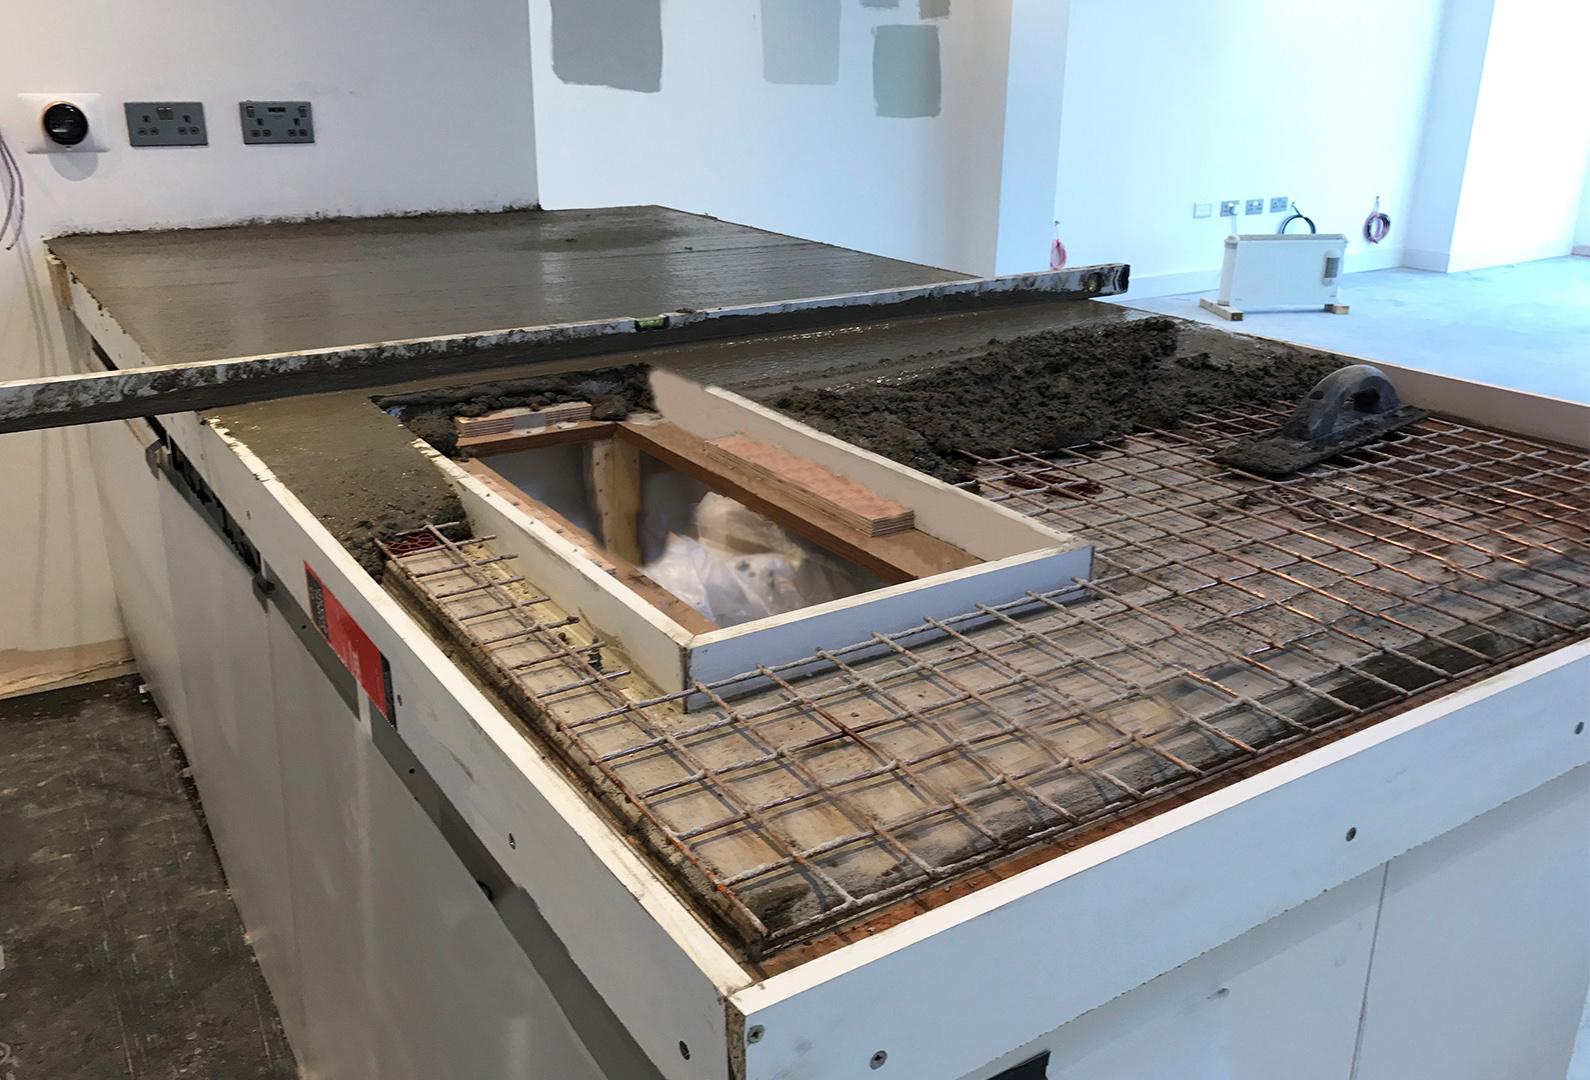 Concrete poring for the worktop